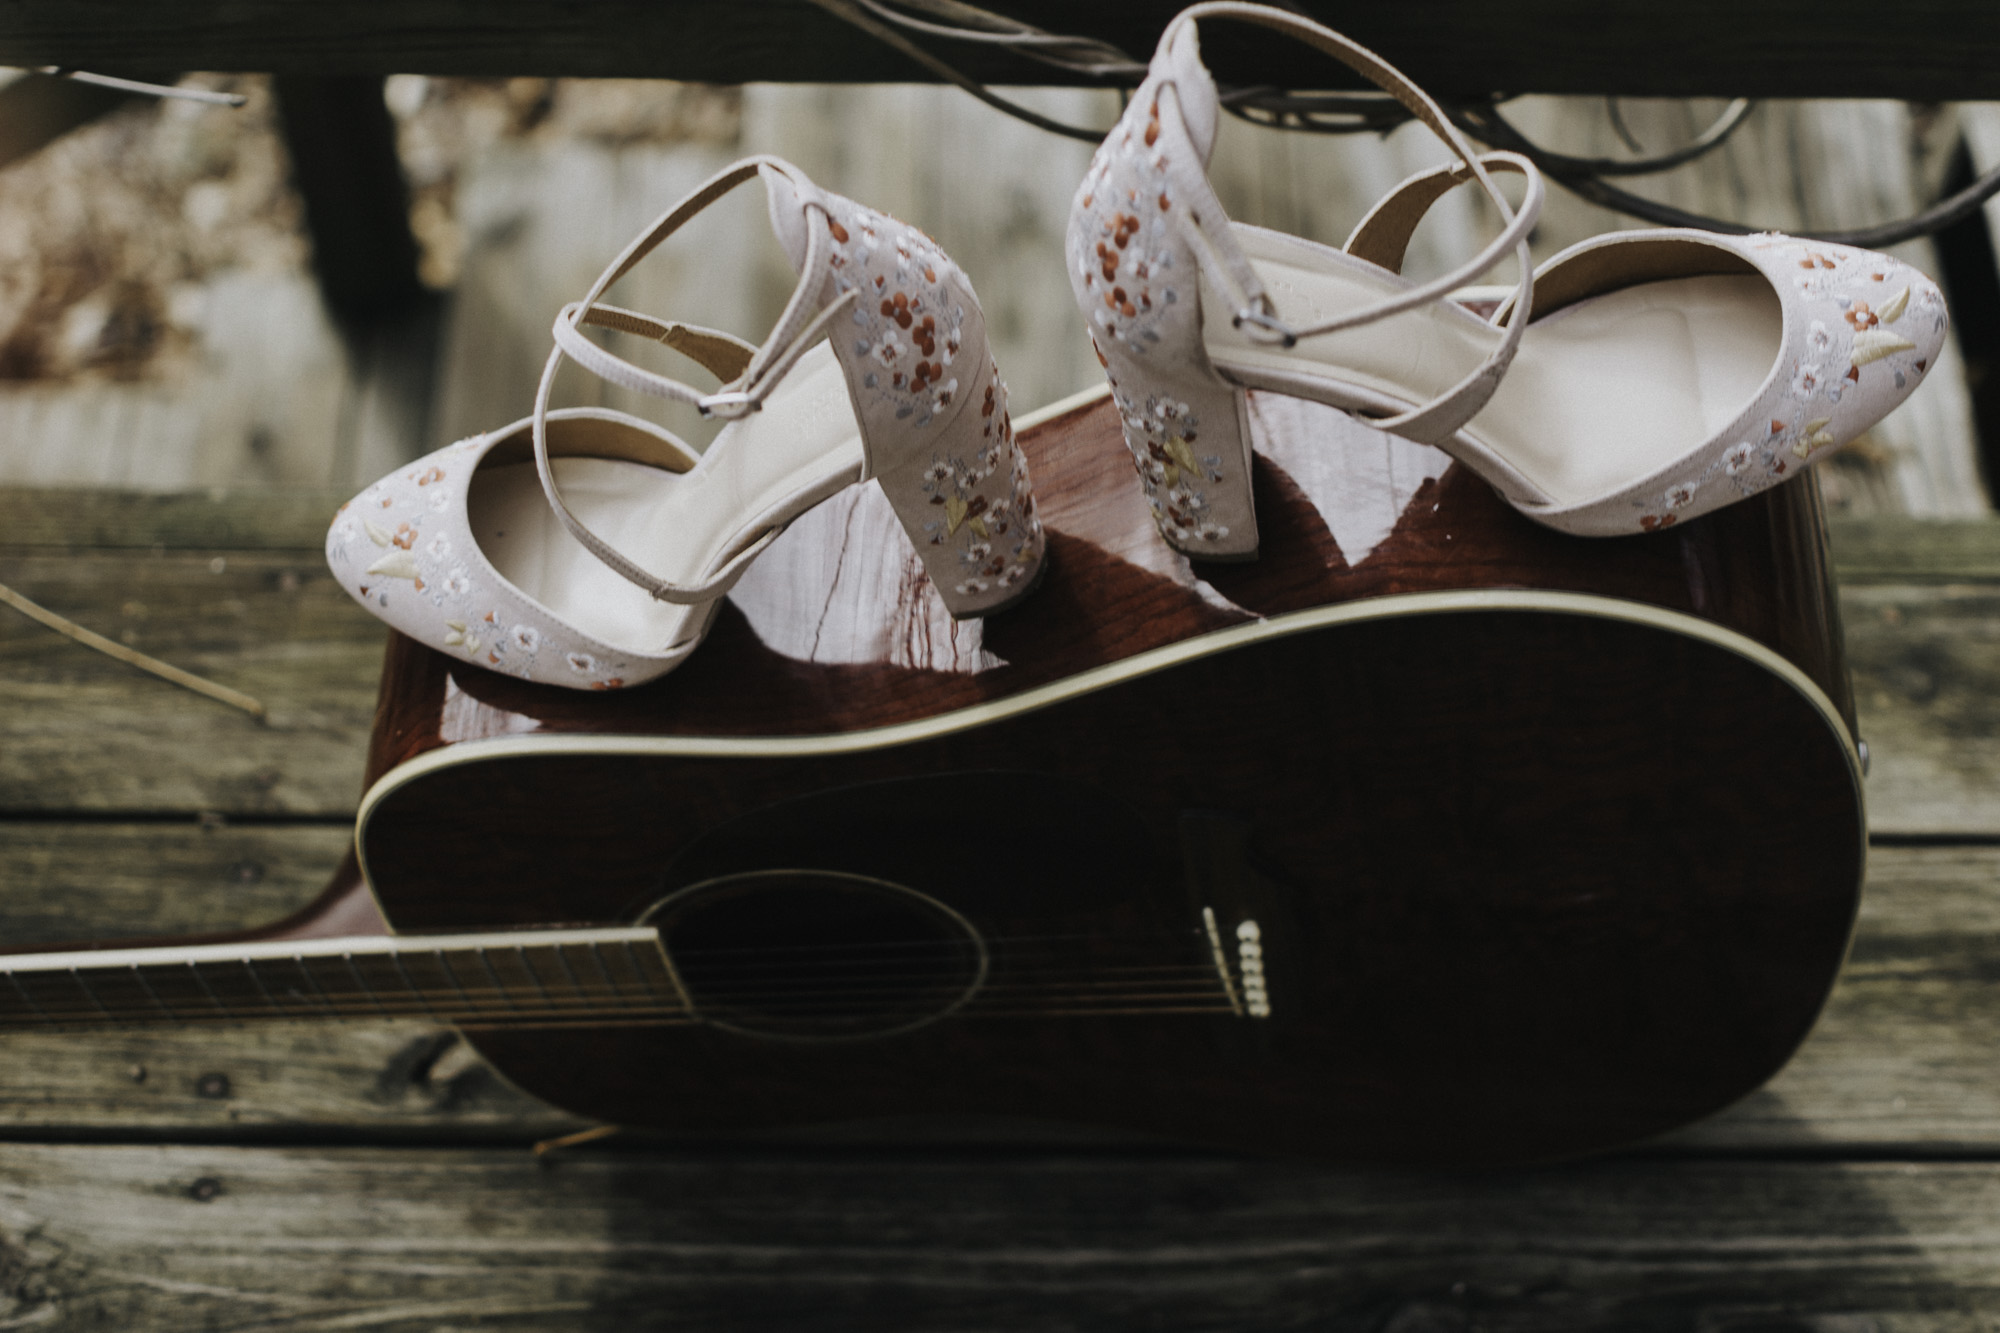 Cate_Ann_Photography_Dayton_Ohio_Wedding_Elopement_And_Engagement_PhotographerDSC_5649.jpg